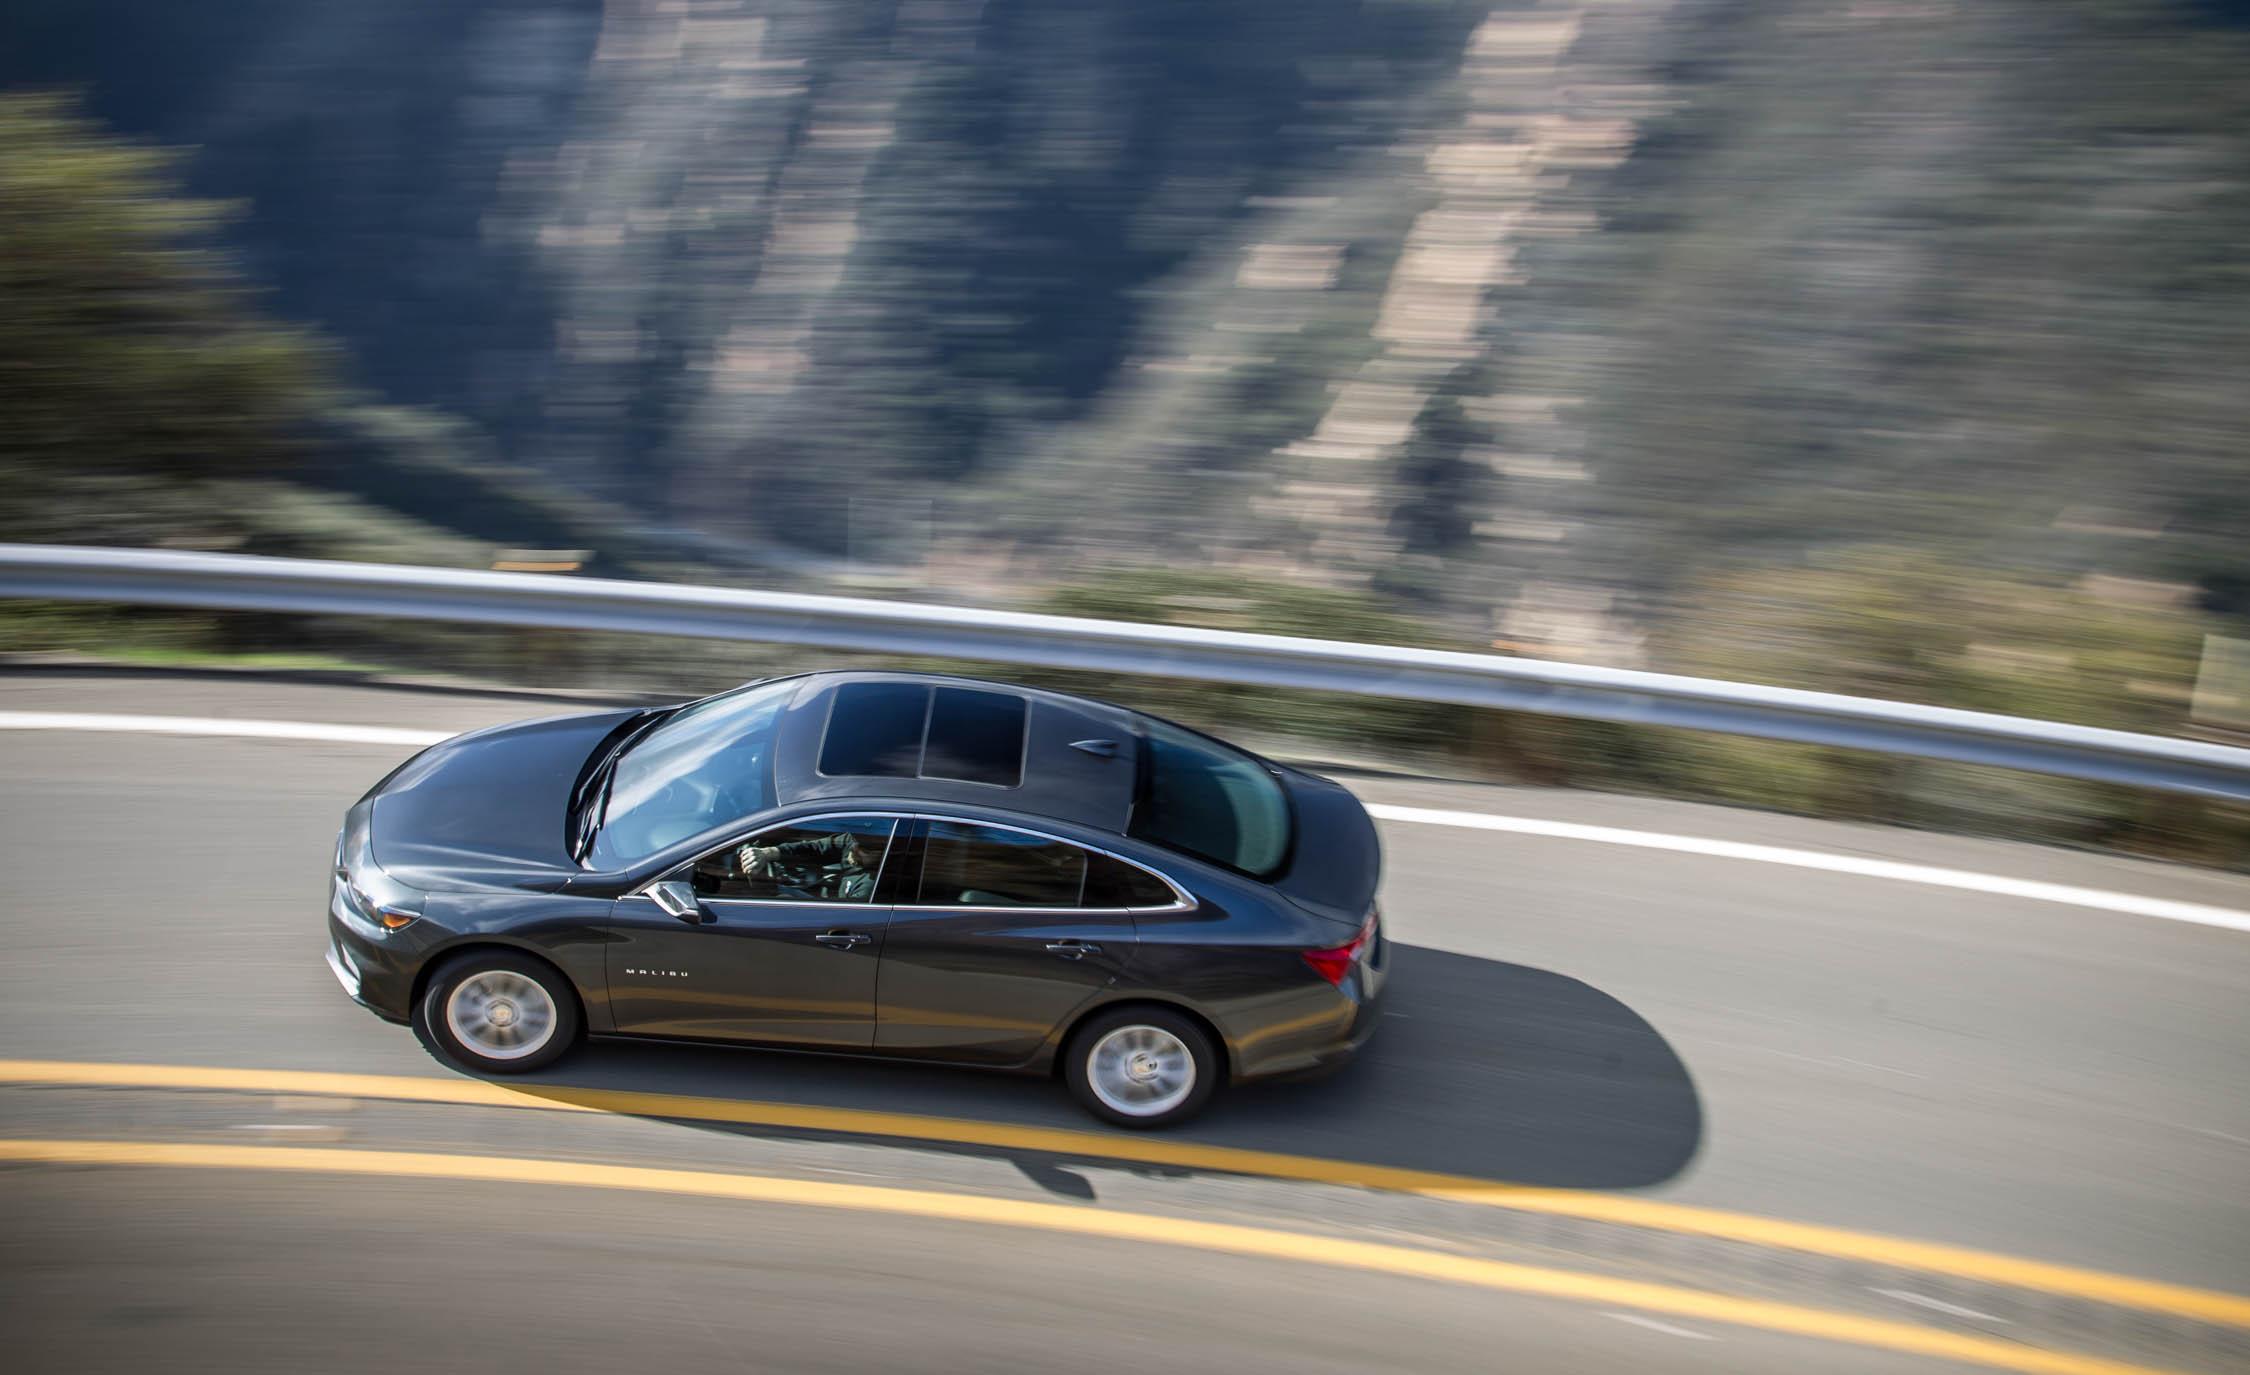 2016 Chevrolet Malibu LT Exterior Full Top